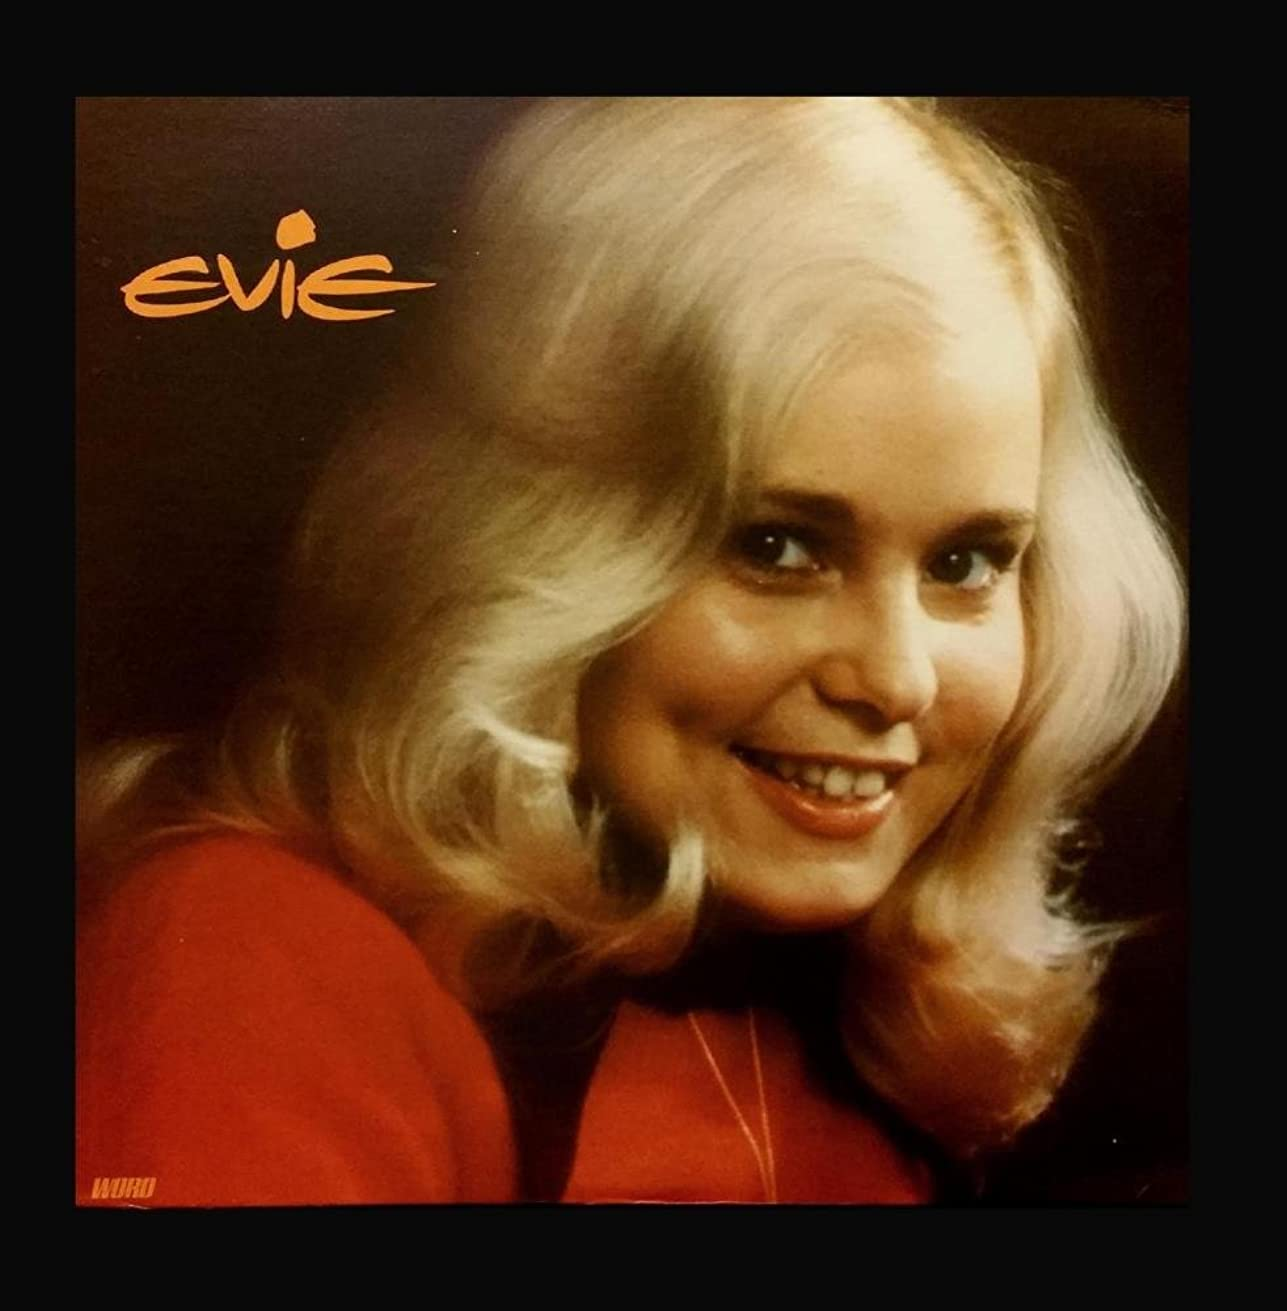 Evie x084668978111134 - dogsalon-ange.com